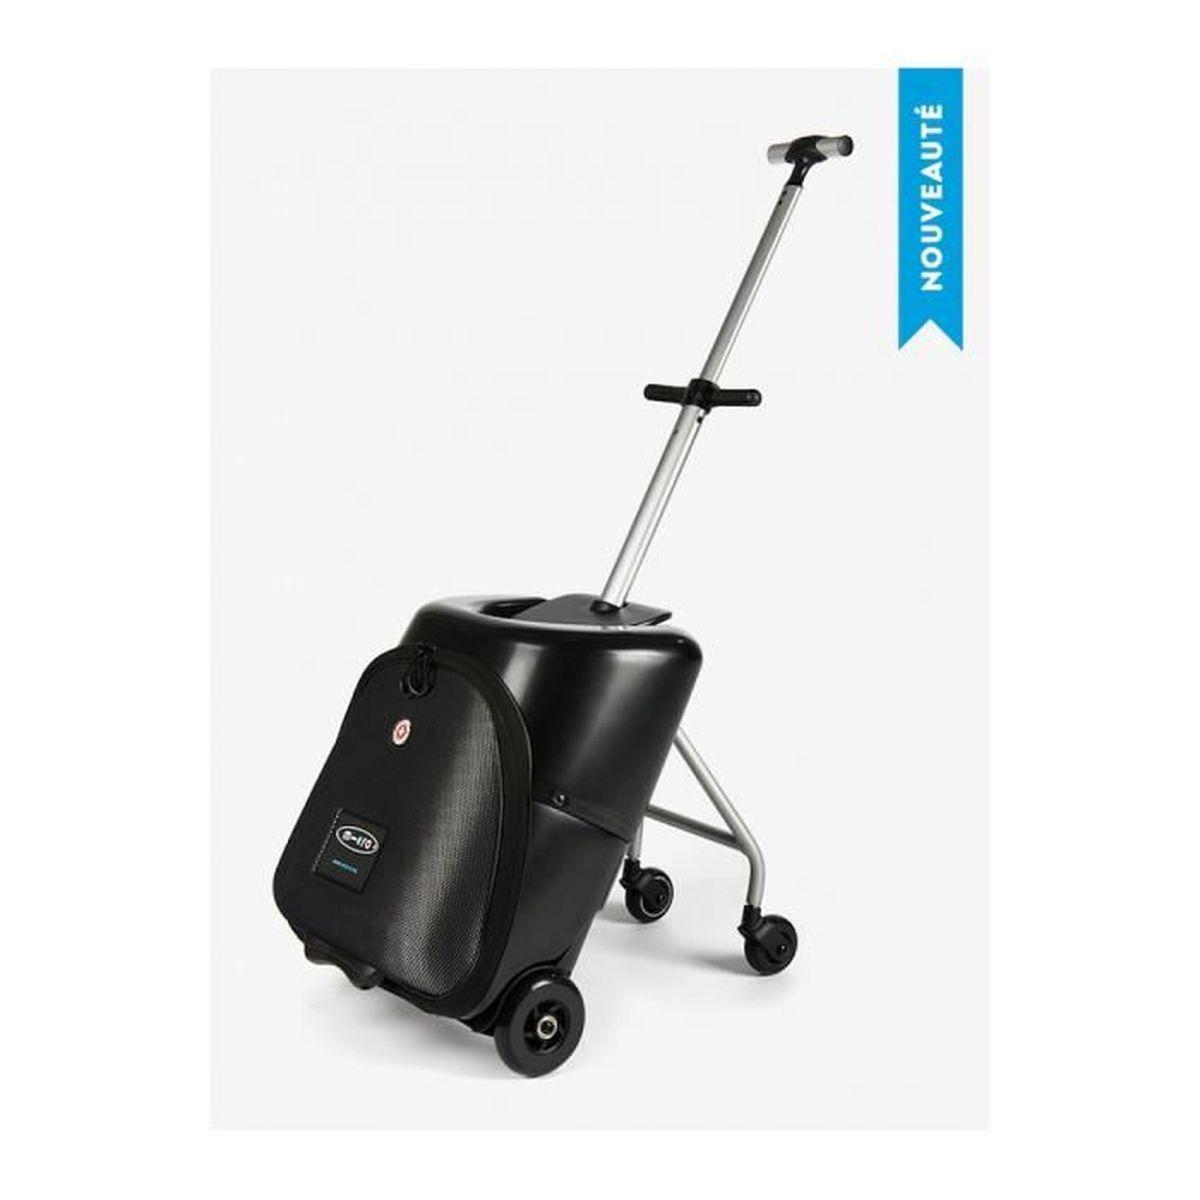 valise micro achat vente valise micro pas cher les soldes sur cdiscount cdiscount. Black Bedroom Furniture Sets. Home Design Ideas